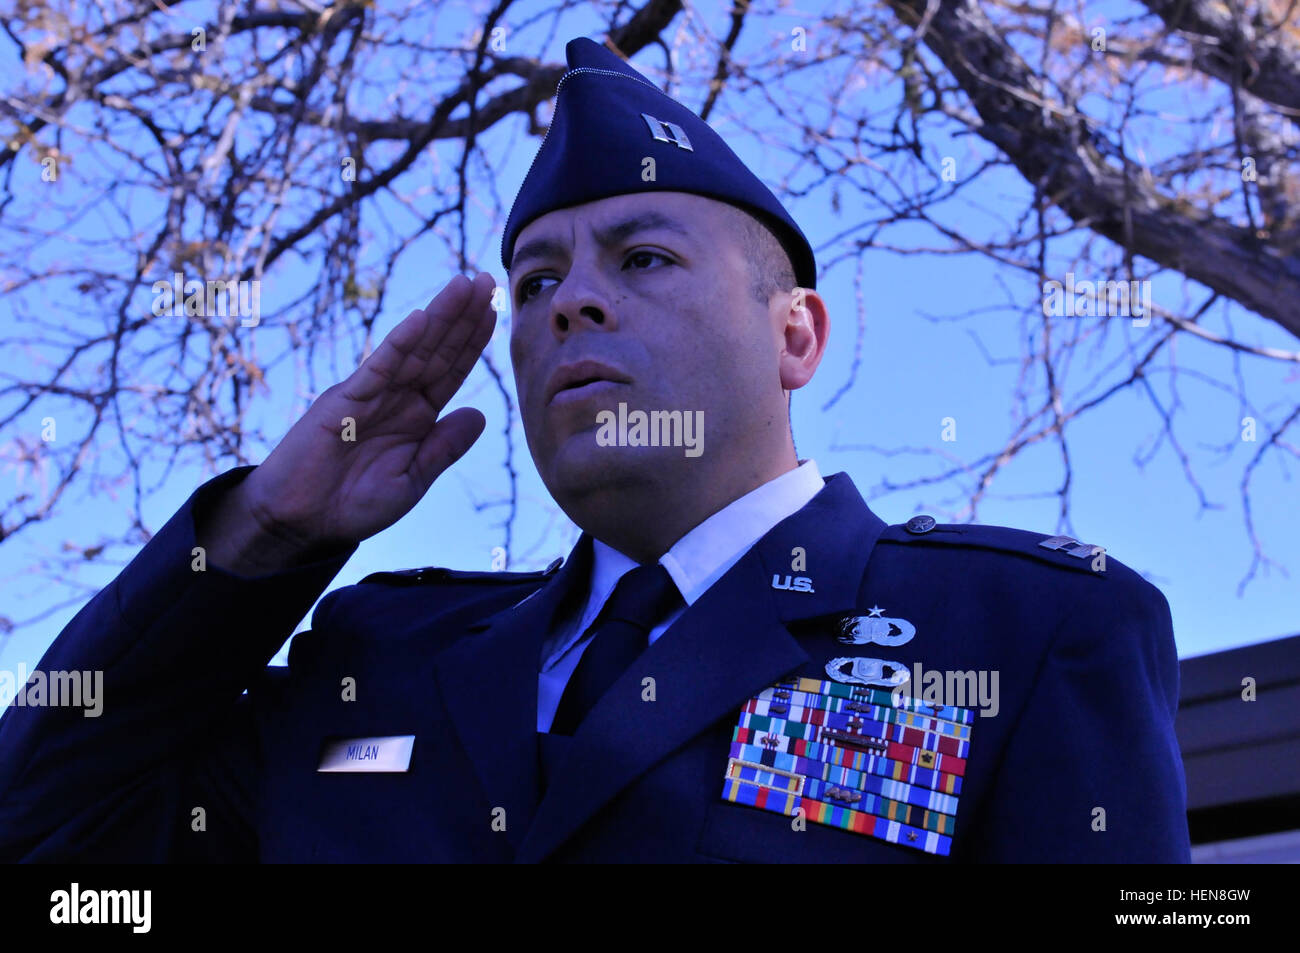 Air Force Capt. Jose Milian salutes the U.S. flag during a Veterans Day flag raising celebration at Burton Elementary Stock Photo